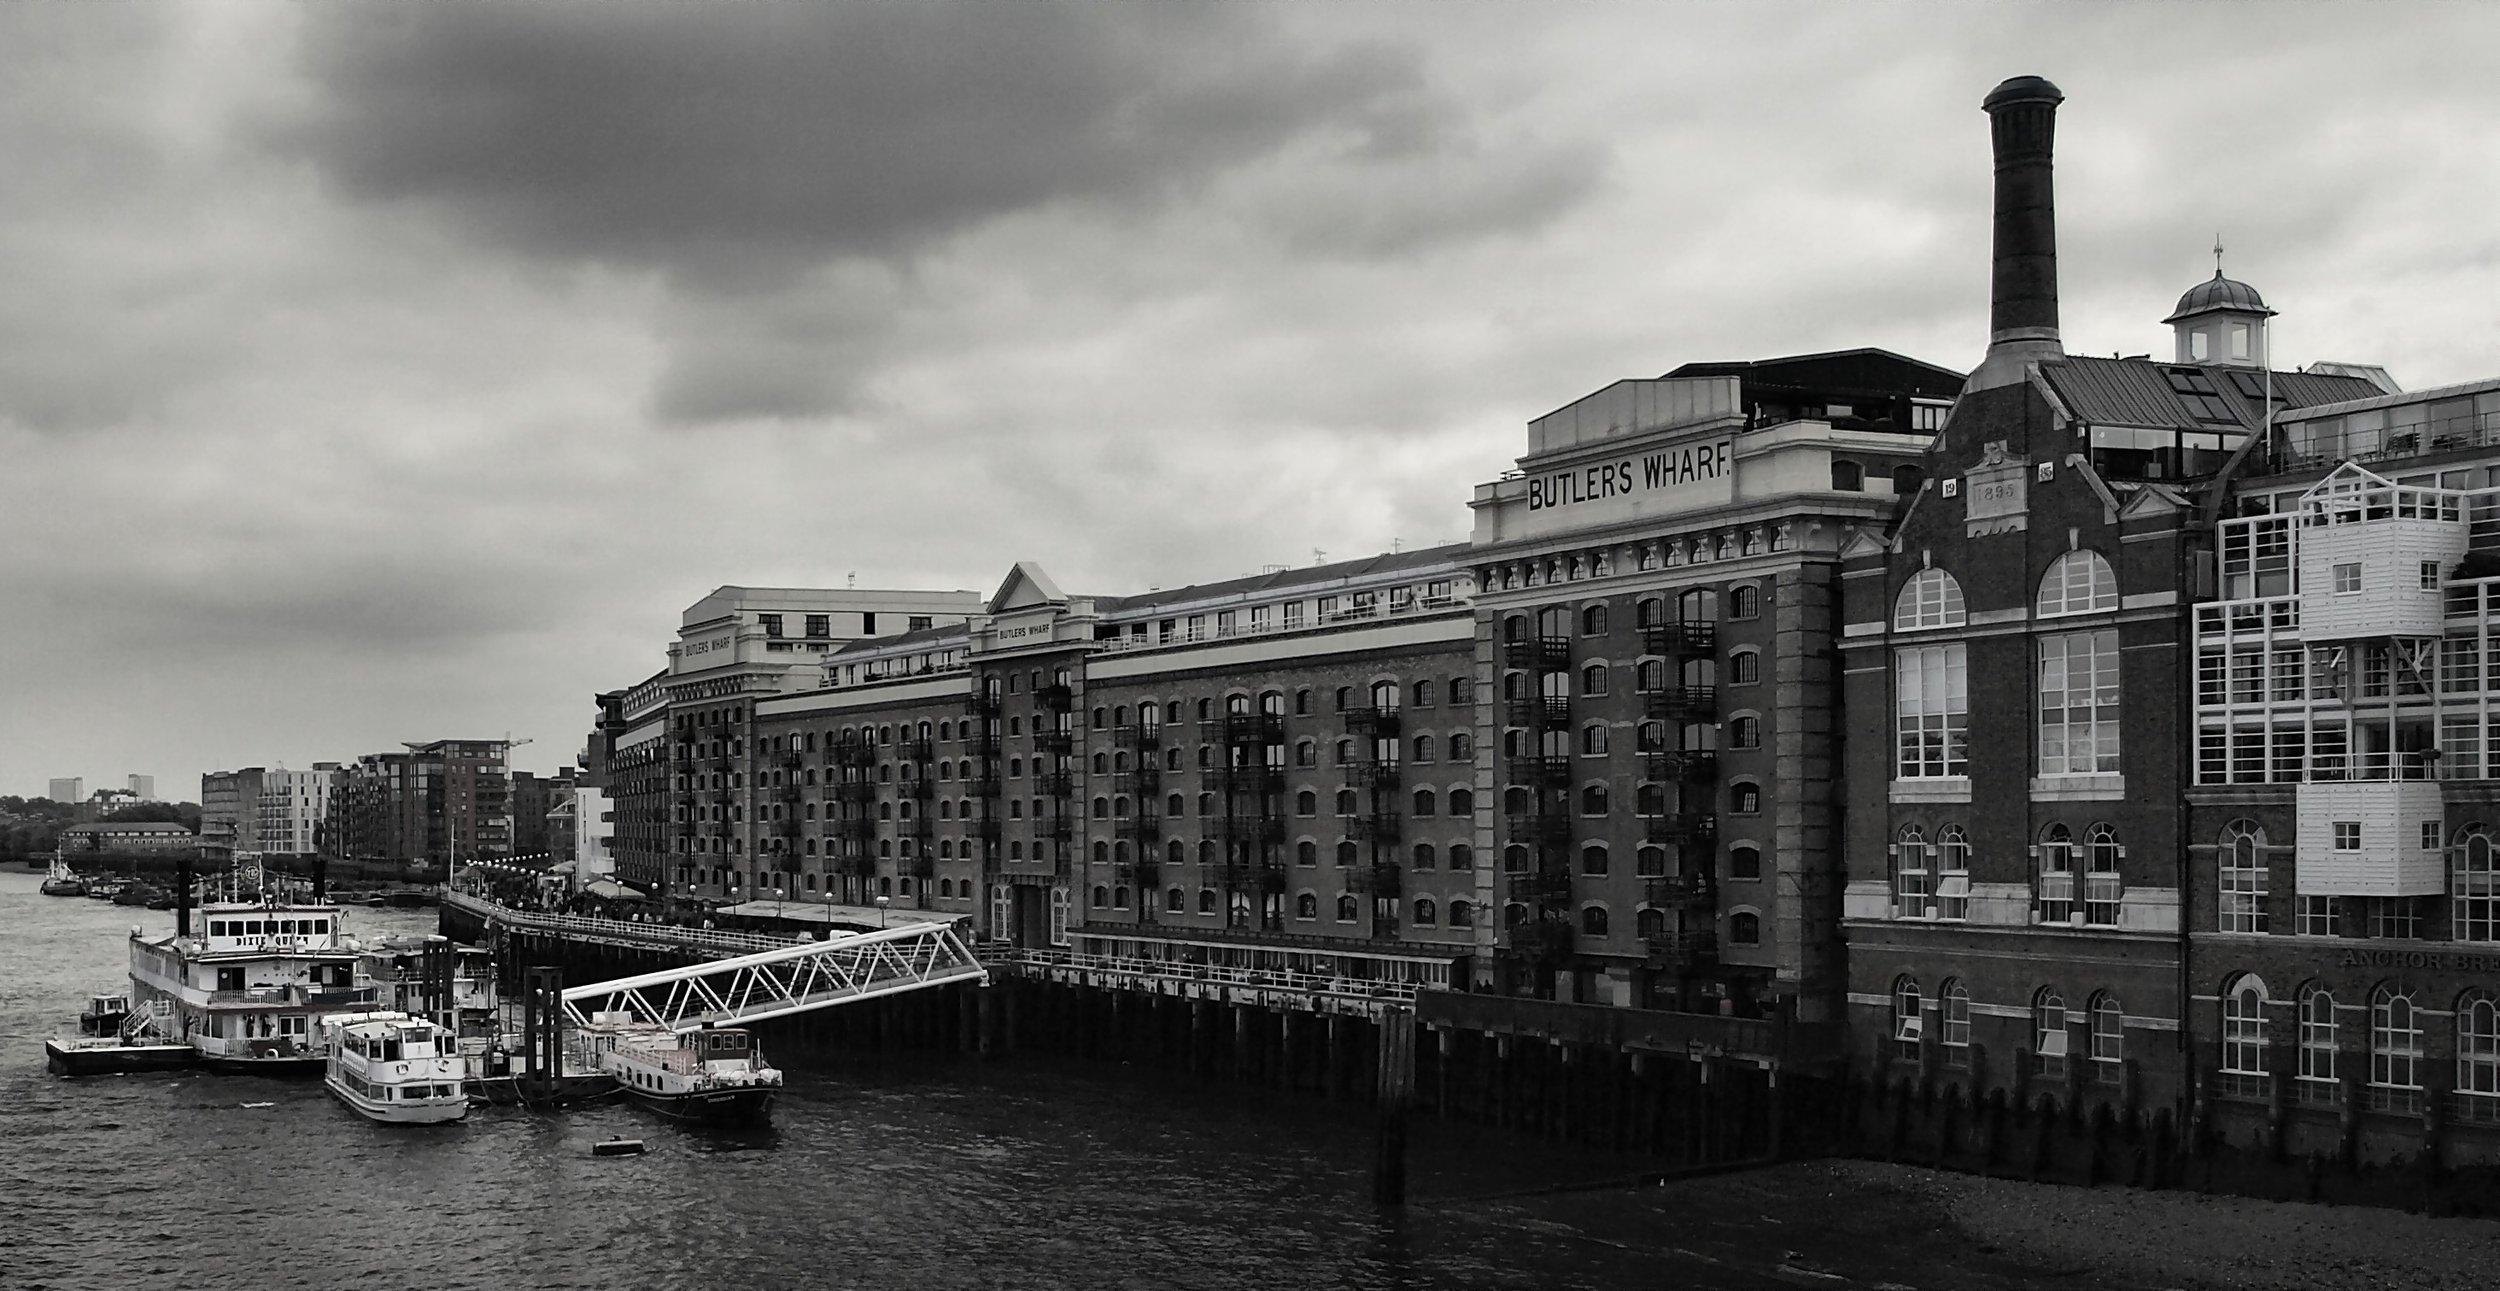 Butler's Wharf, Central London